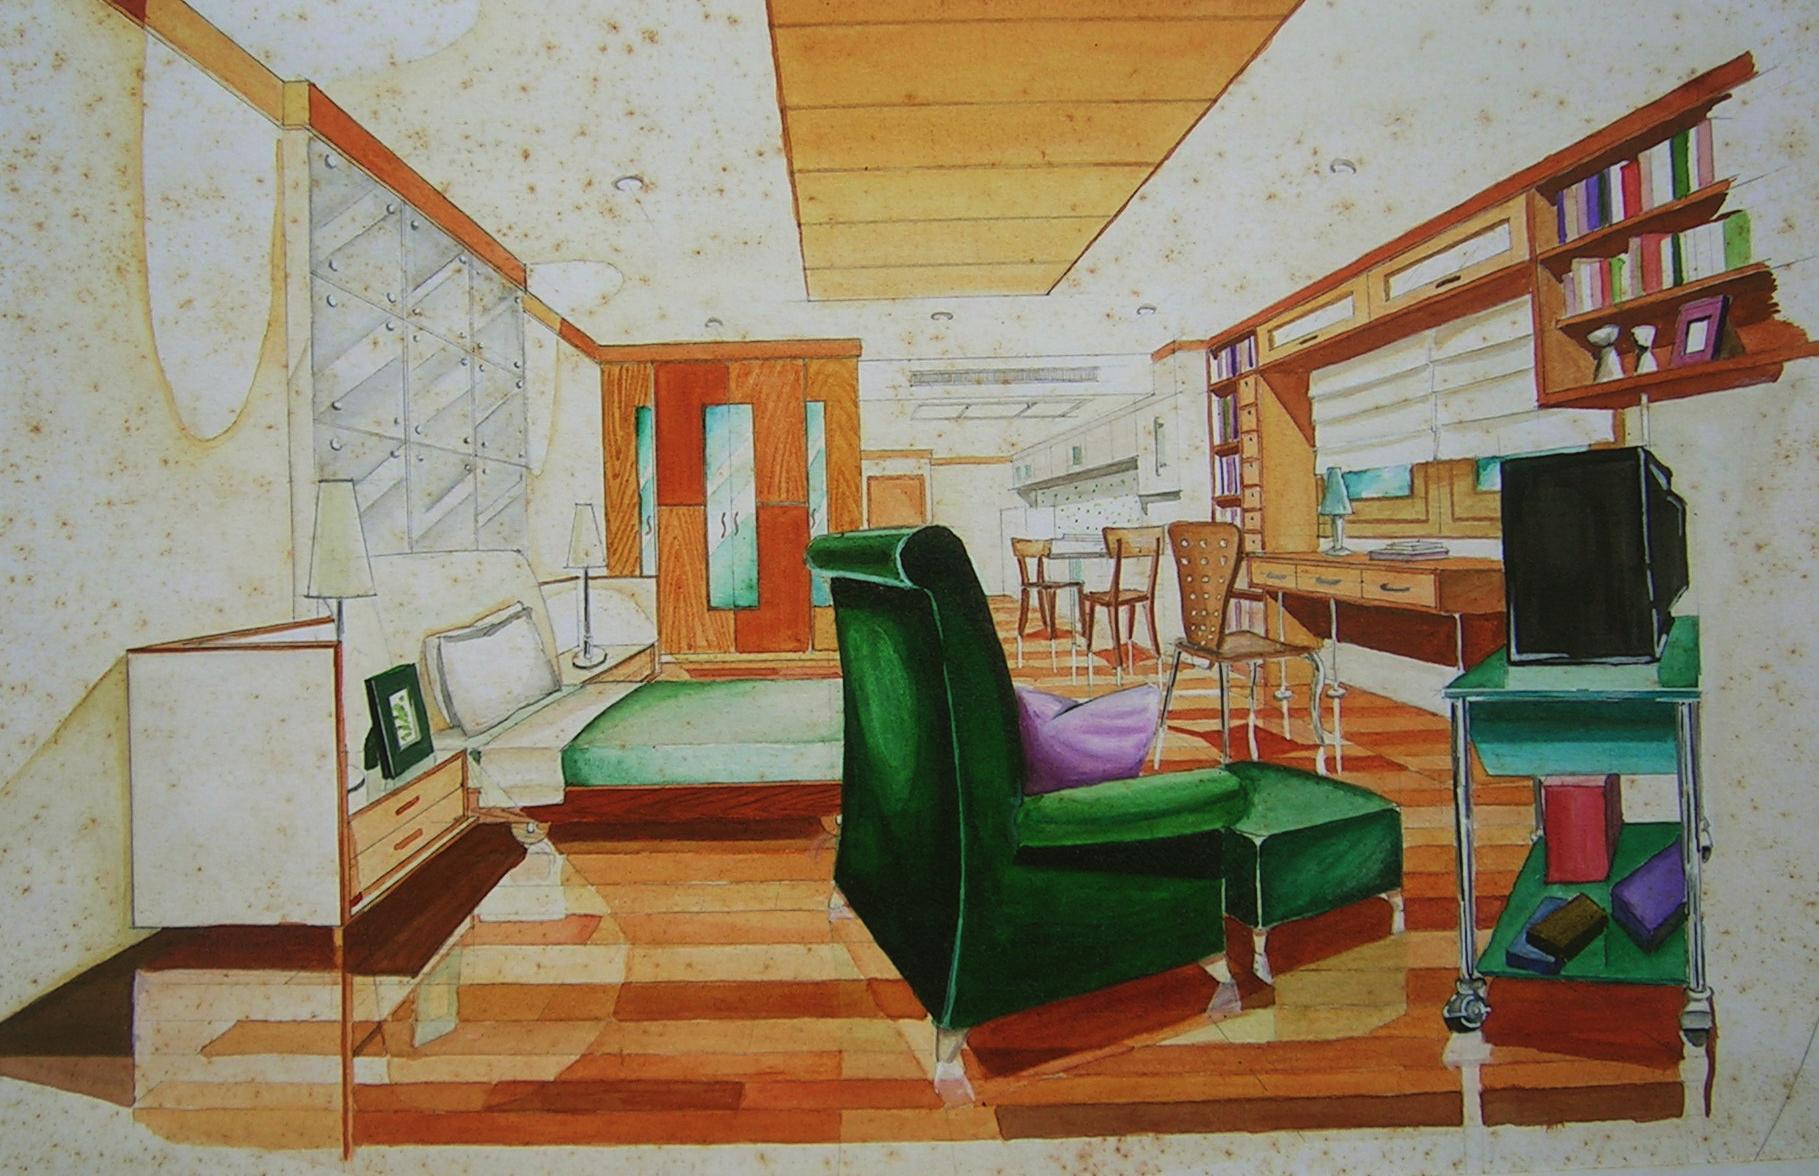 Awesome Sketch Perspective By Ekachai Lim At Coroflotcom